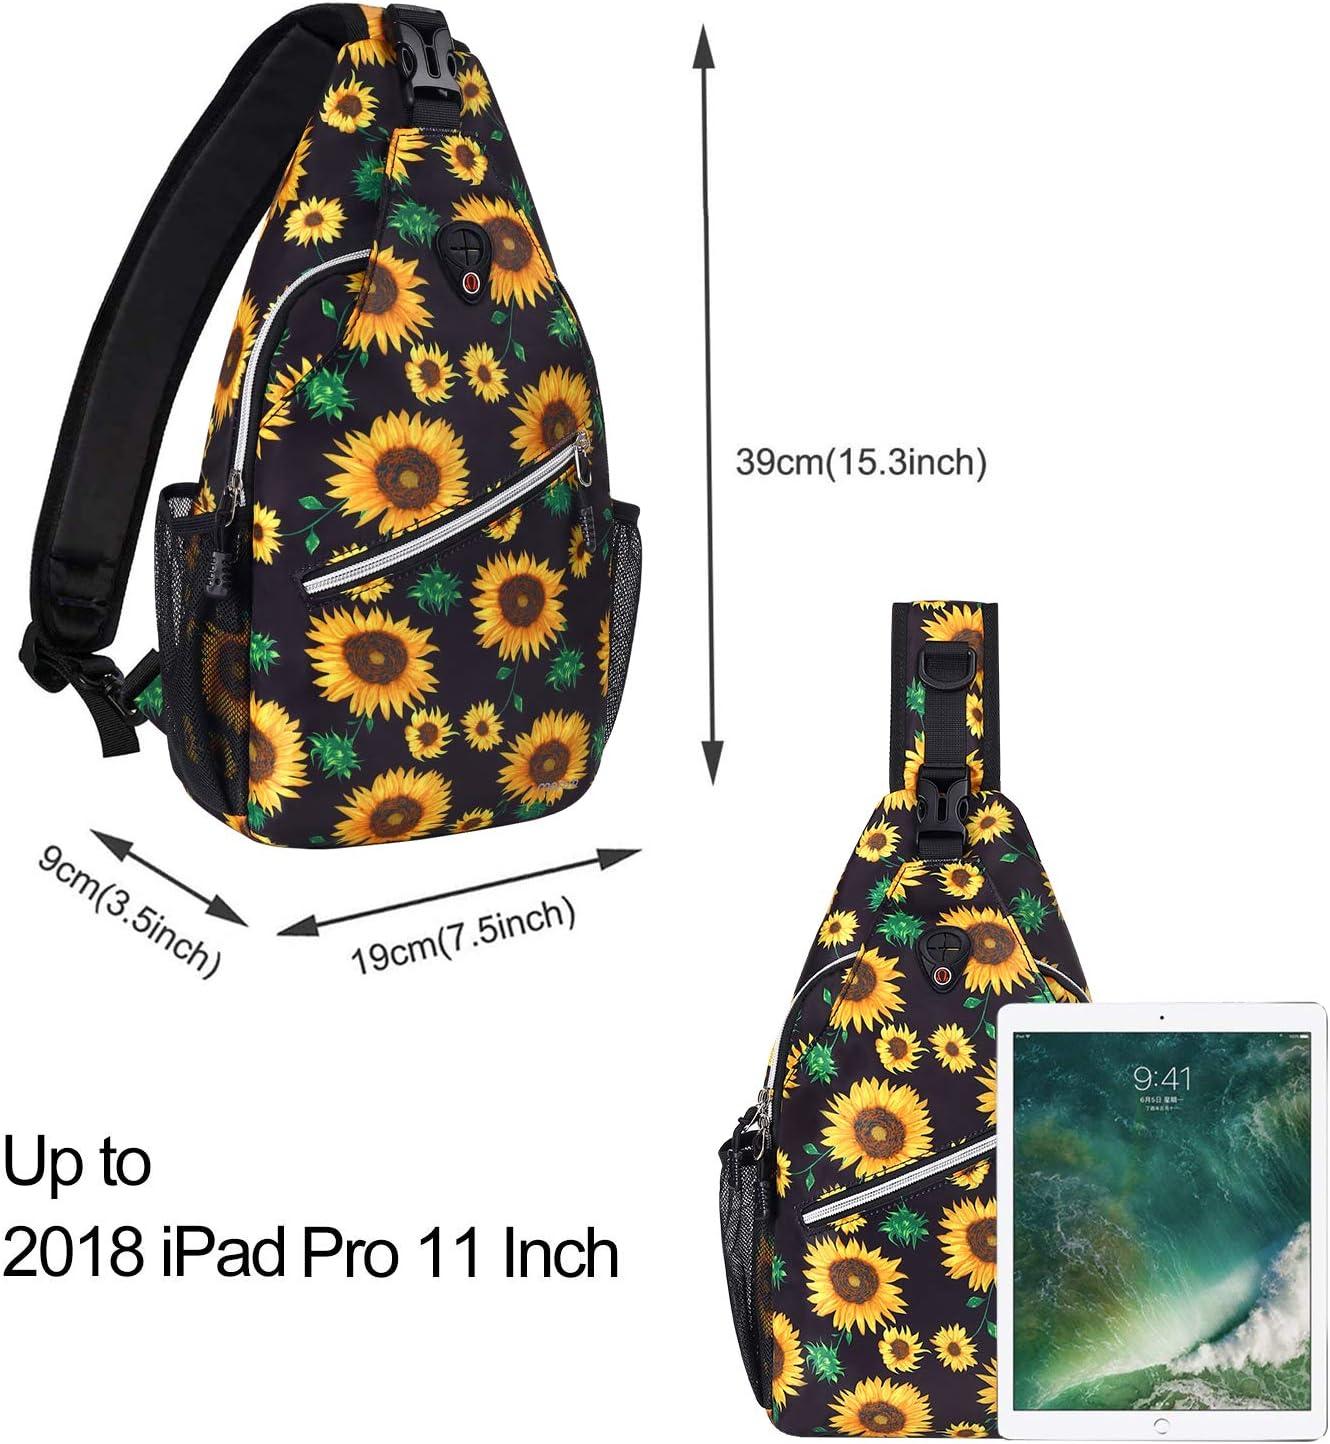 MOSISO Sling Backpack,Travel Hiking Daypack Pattern Rope Crossbody Shoulder Bag Black Base Sunflower